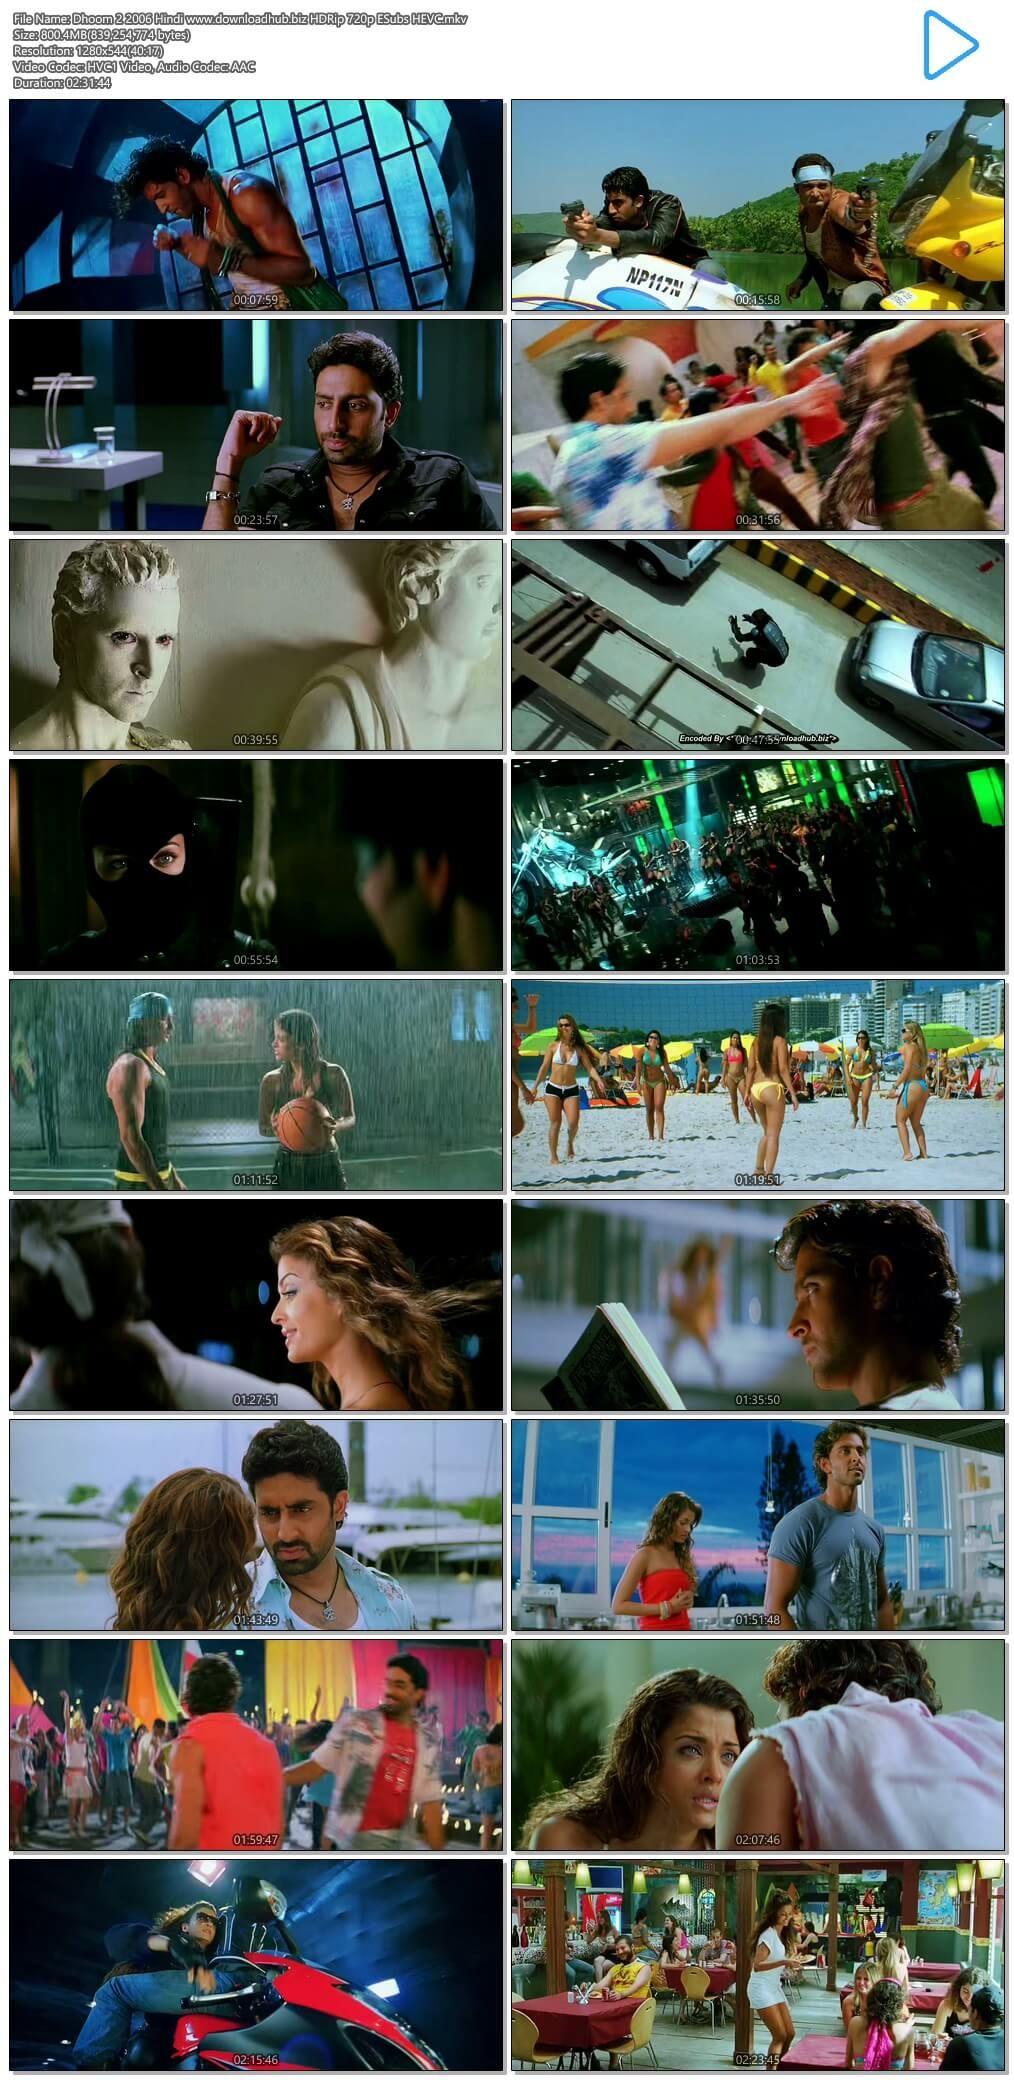 Dhoom 2 2006 Hindi 700mb Bluray 720p Esubs Hevc Dhoom 2 Best Bollywood Movies Free Movies Online